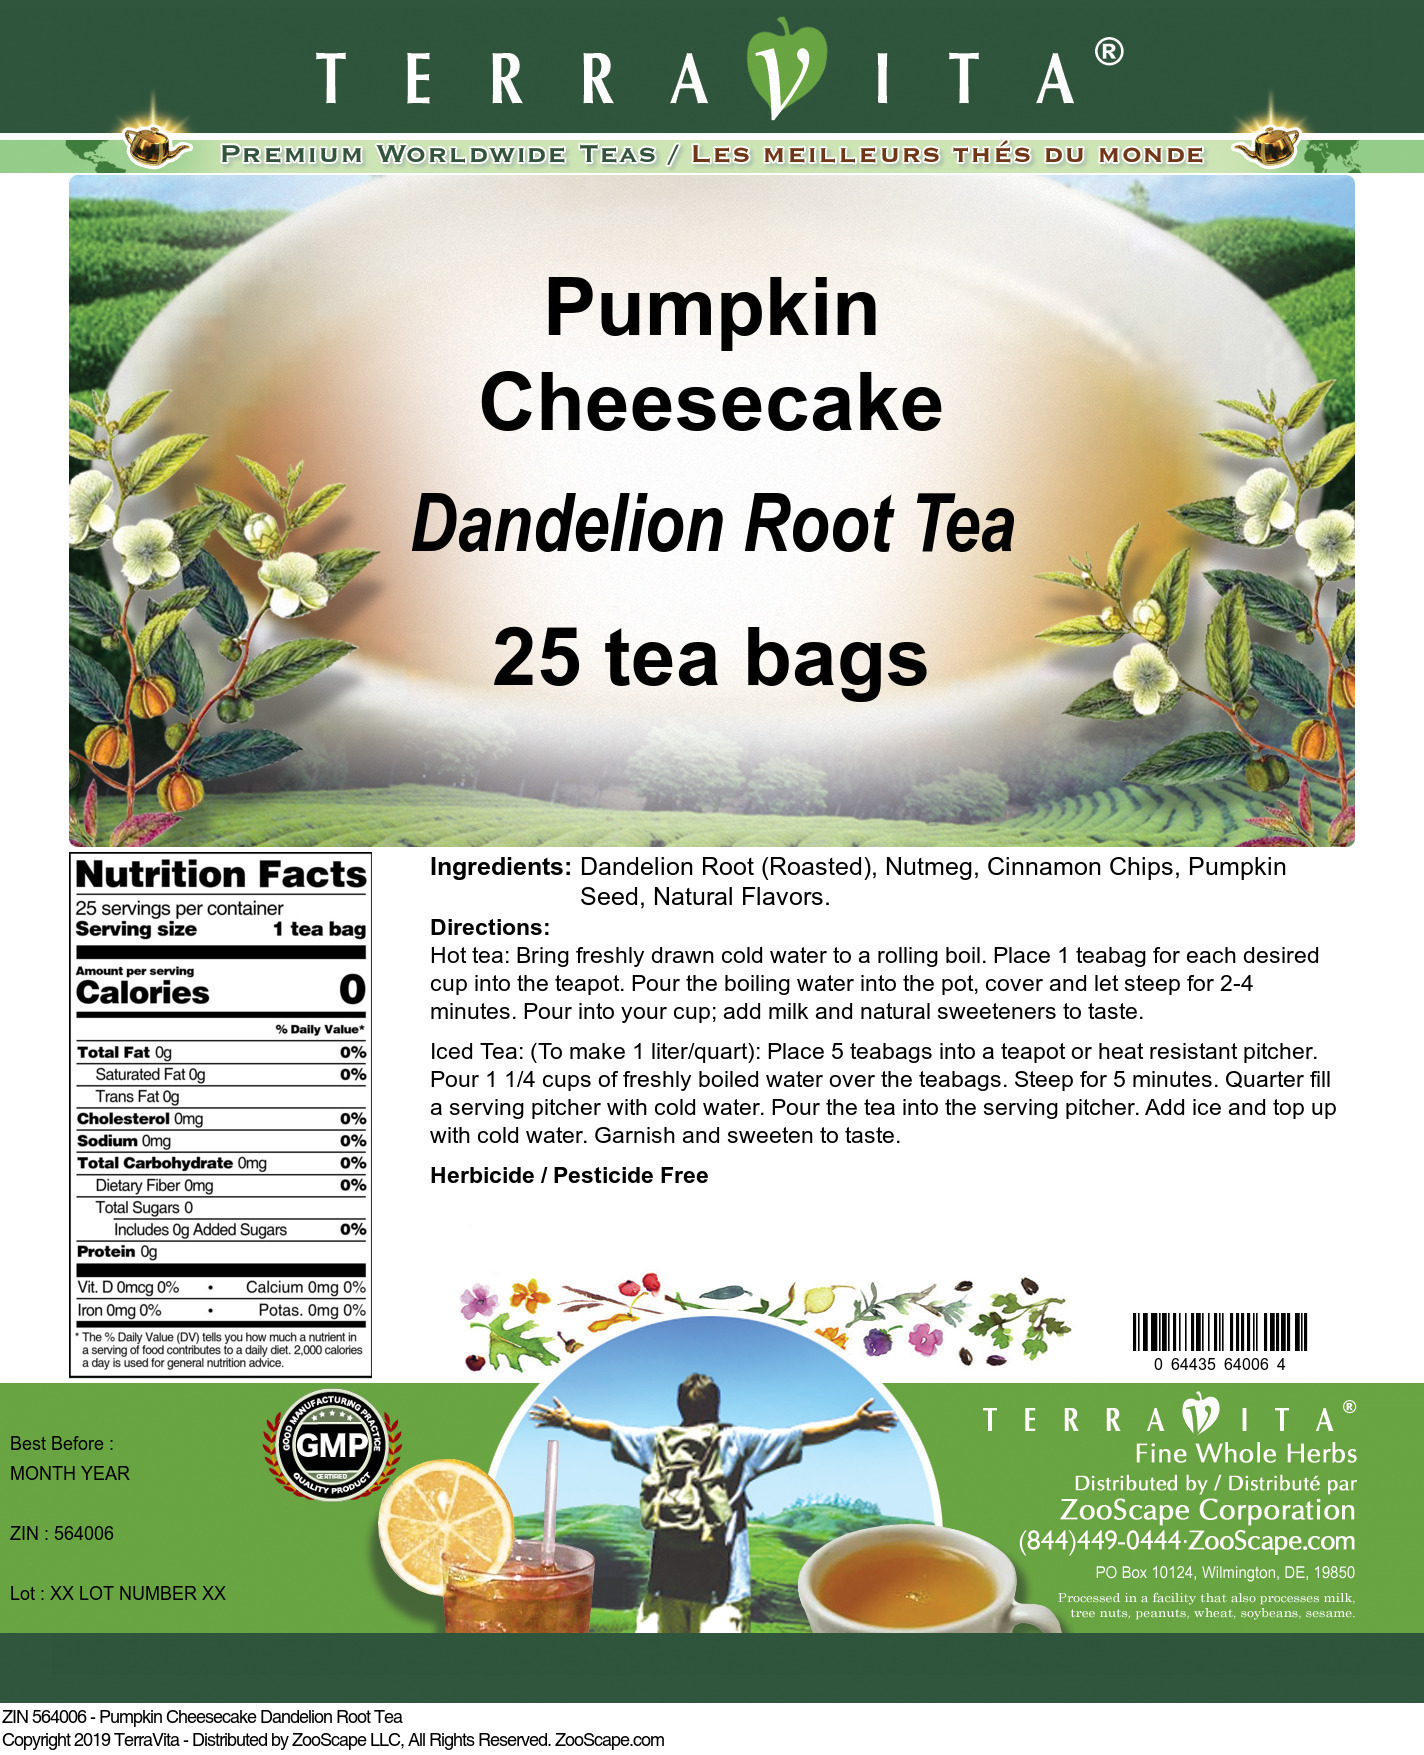 Pumpkin Cheesecake Dandelion Root Tea